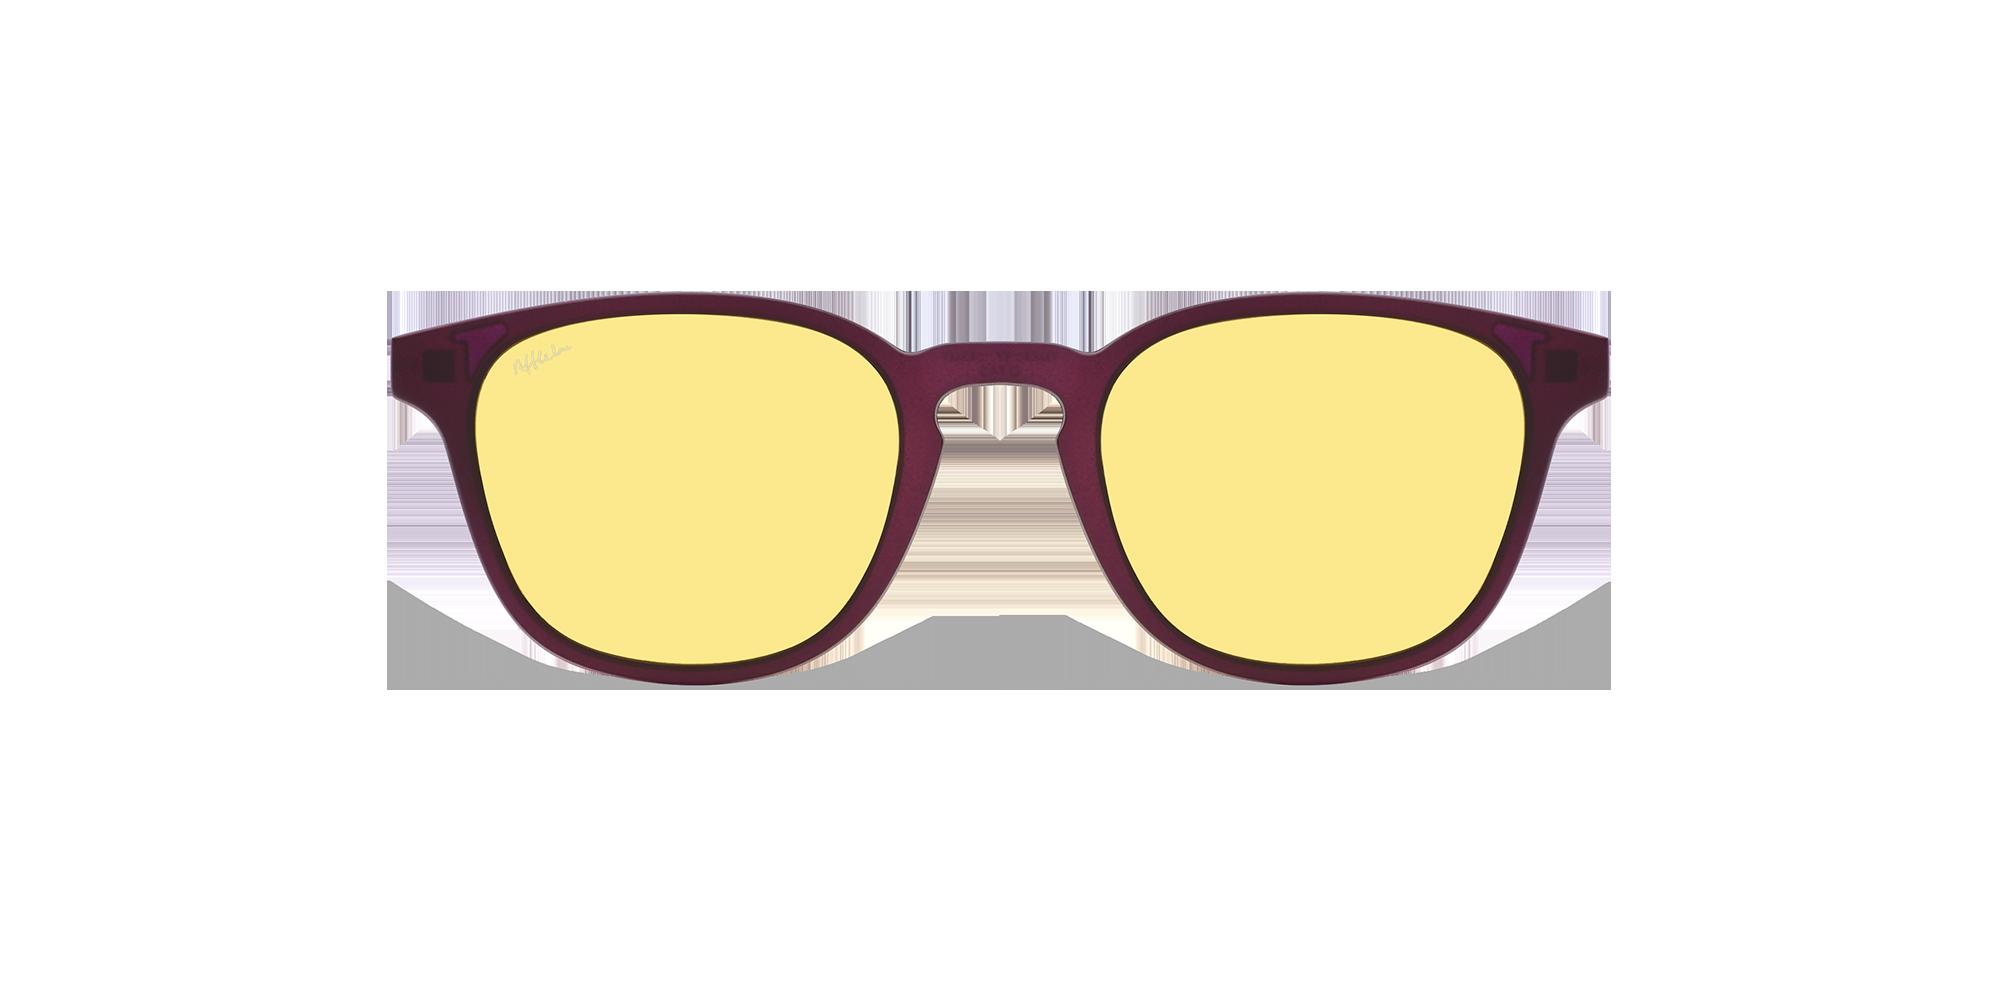 afflelou/france/products/smart_clip/clips_glasses/07630036429259_face.png